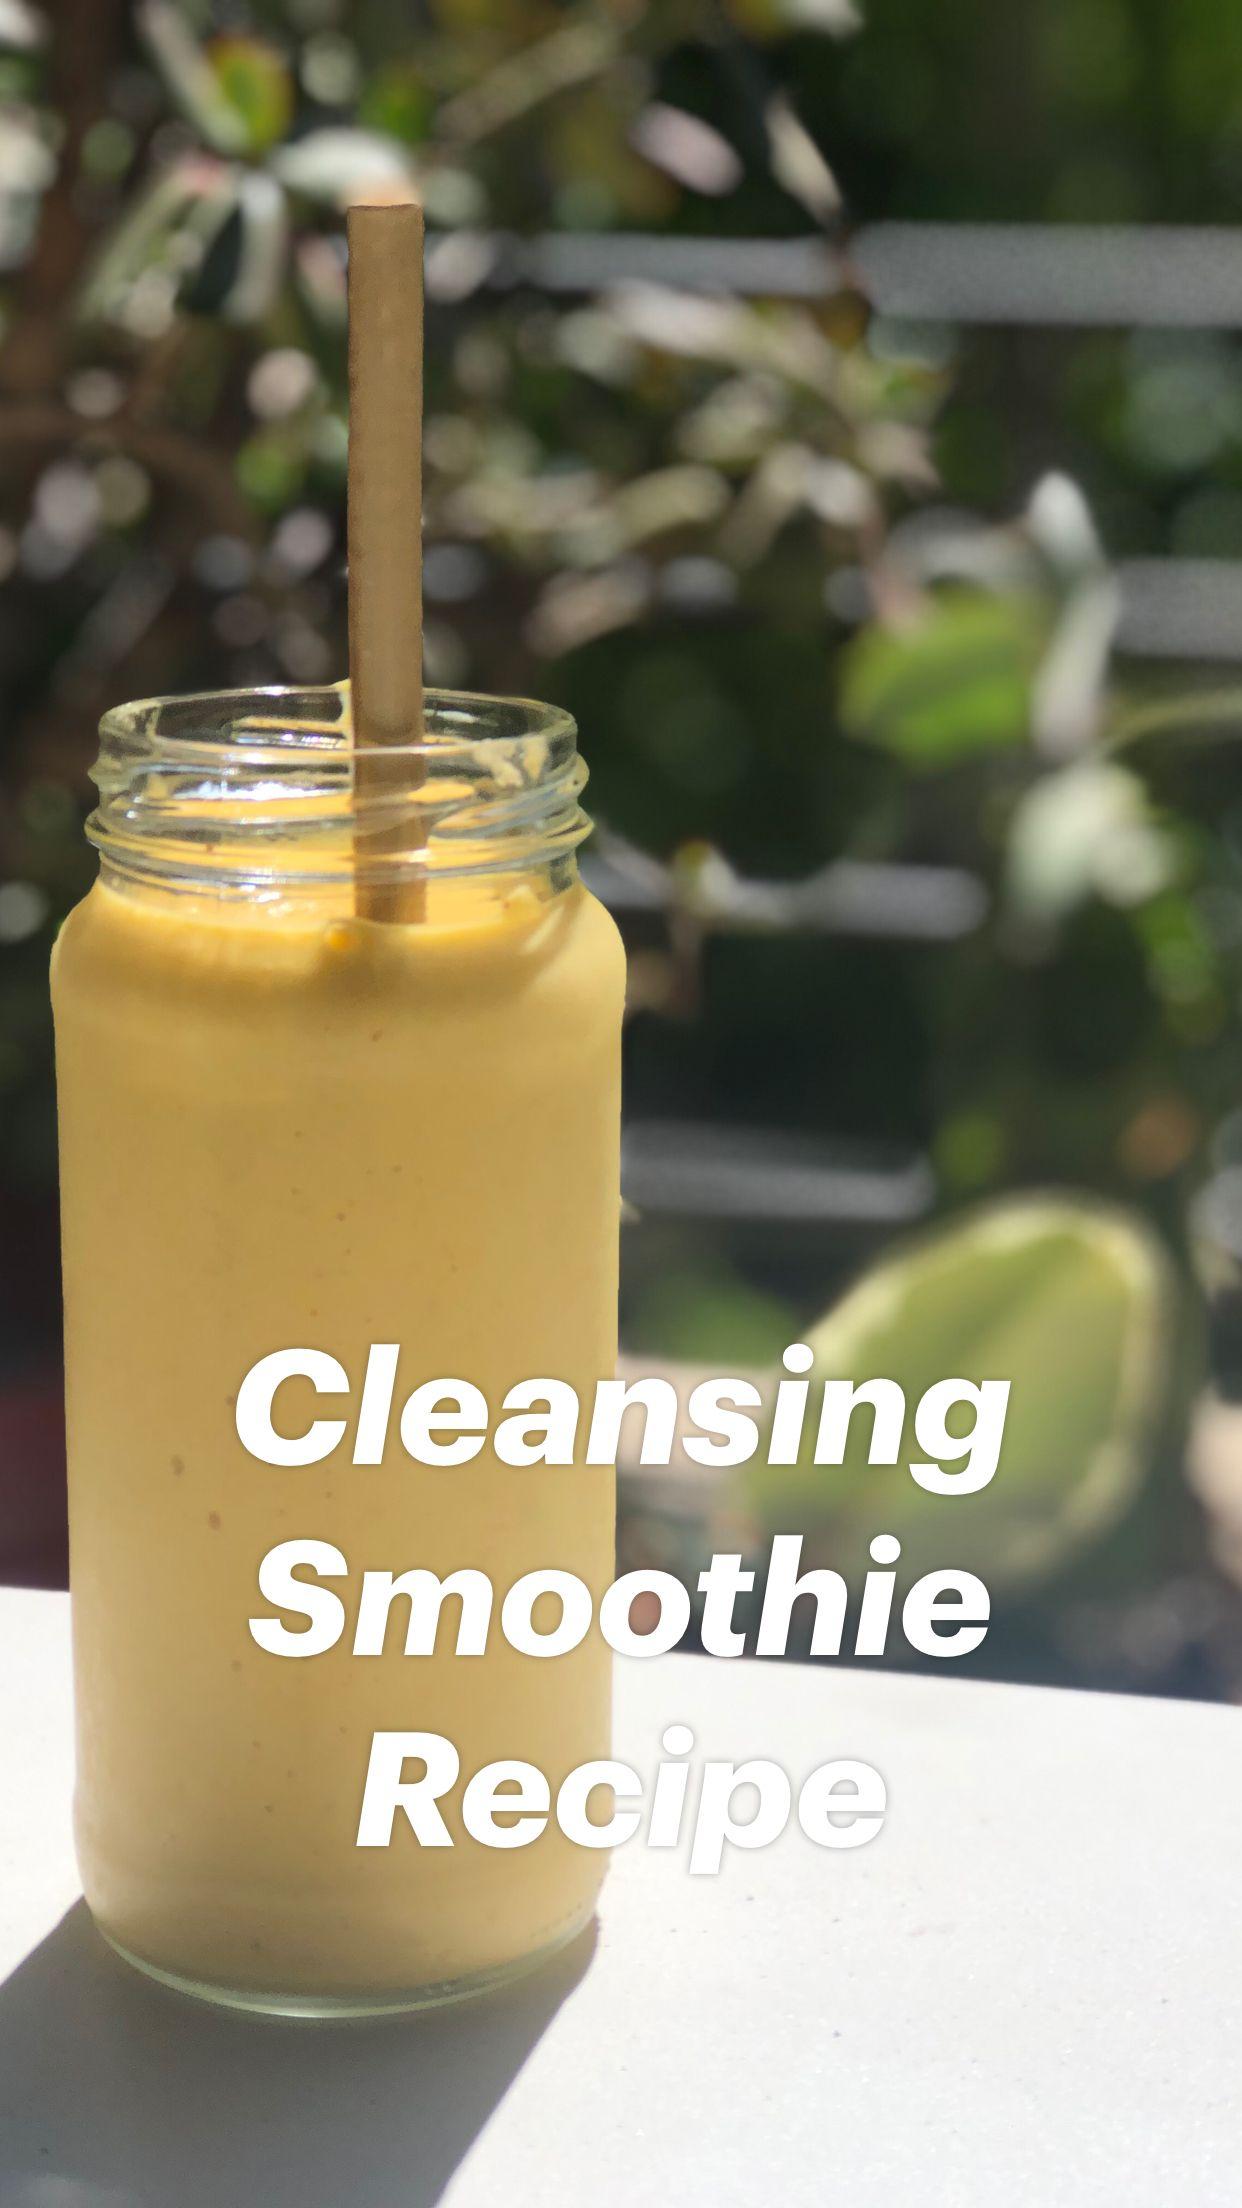 Cleansing Smoothie Recipe